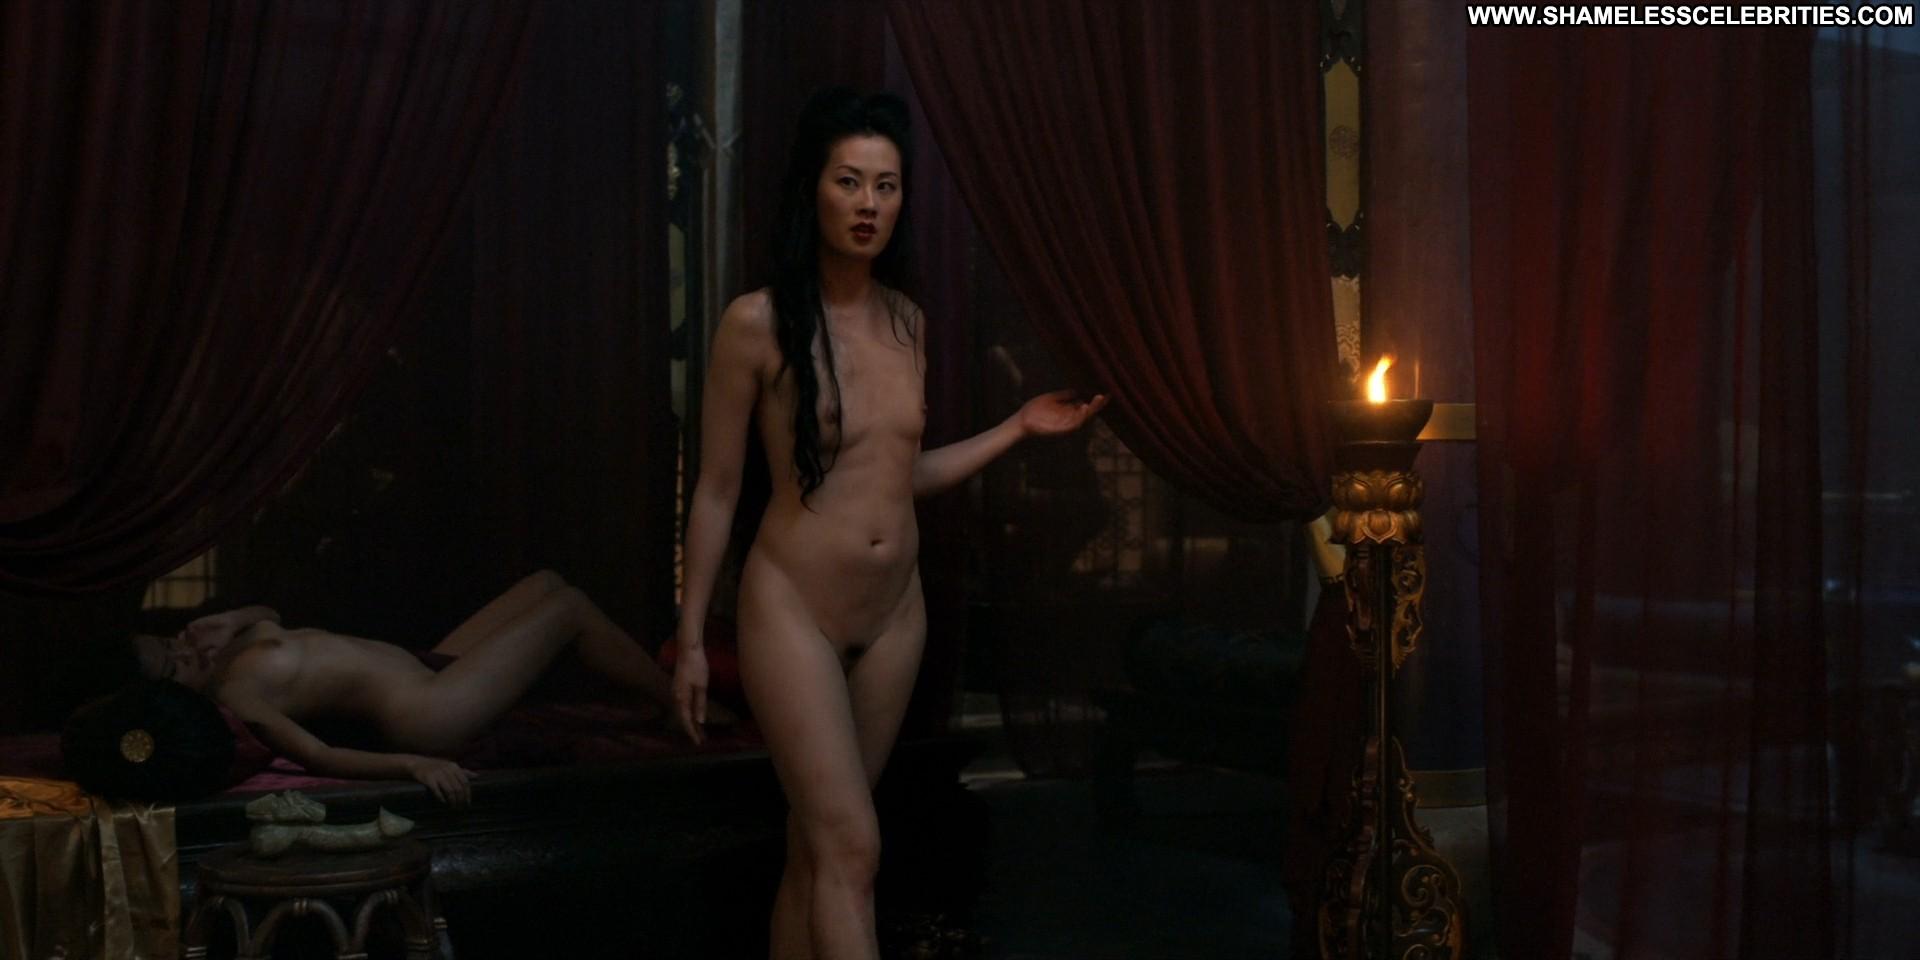 Olivia cheng nude marco polo s01e034 6